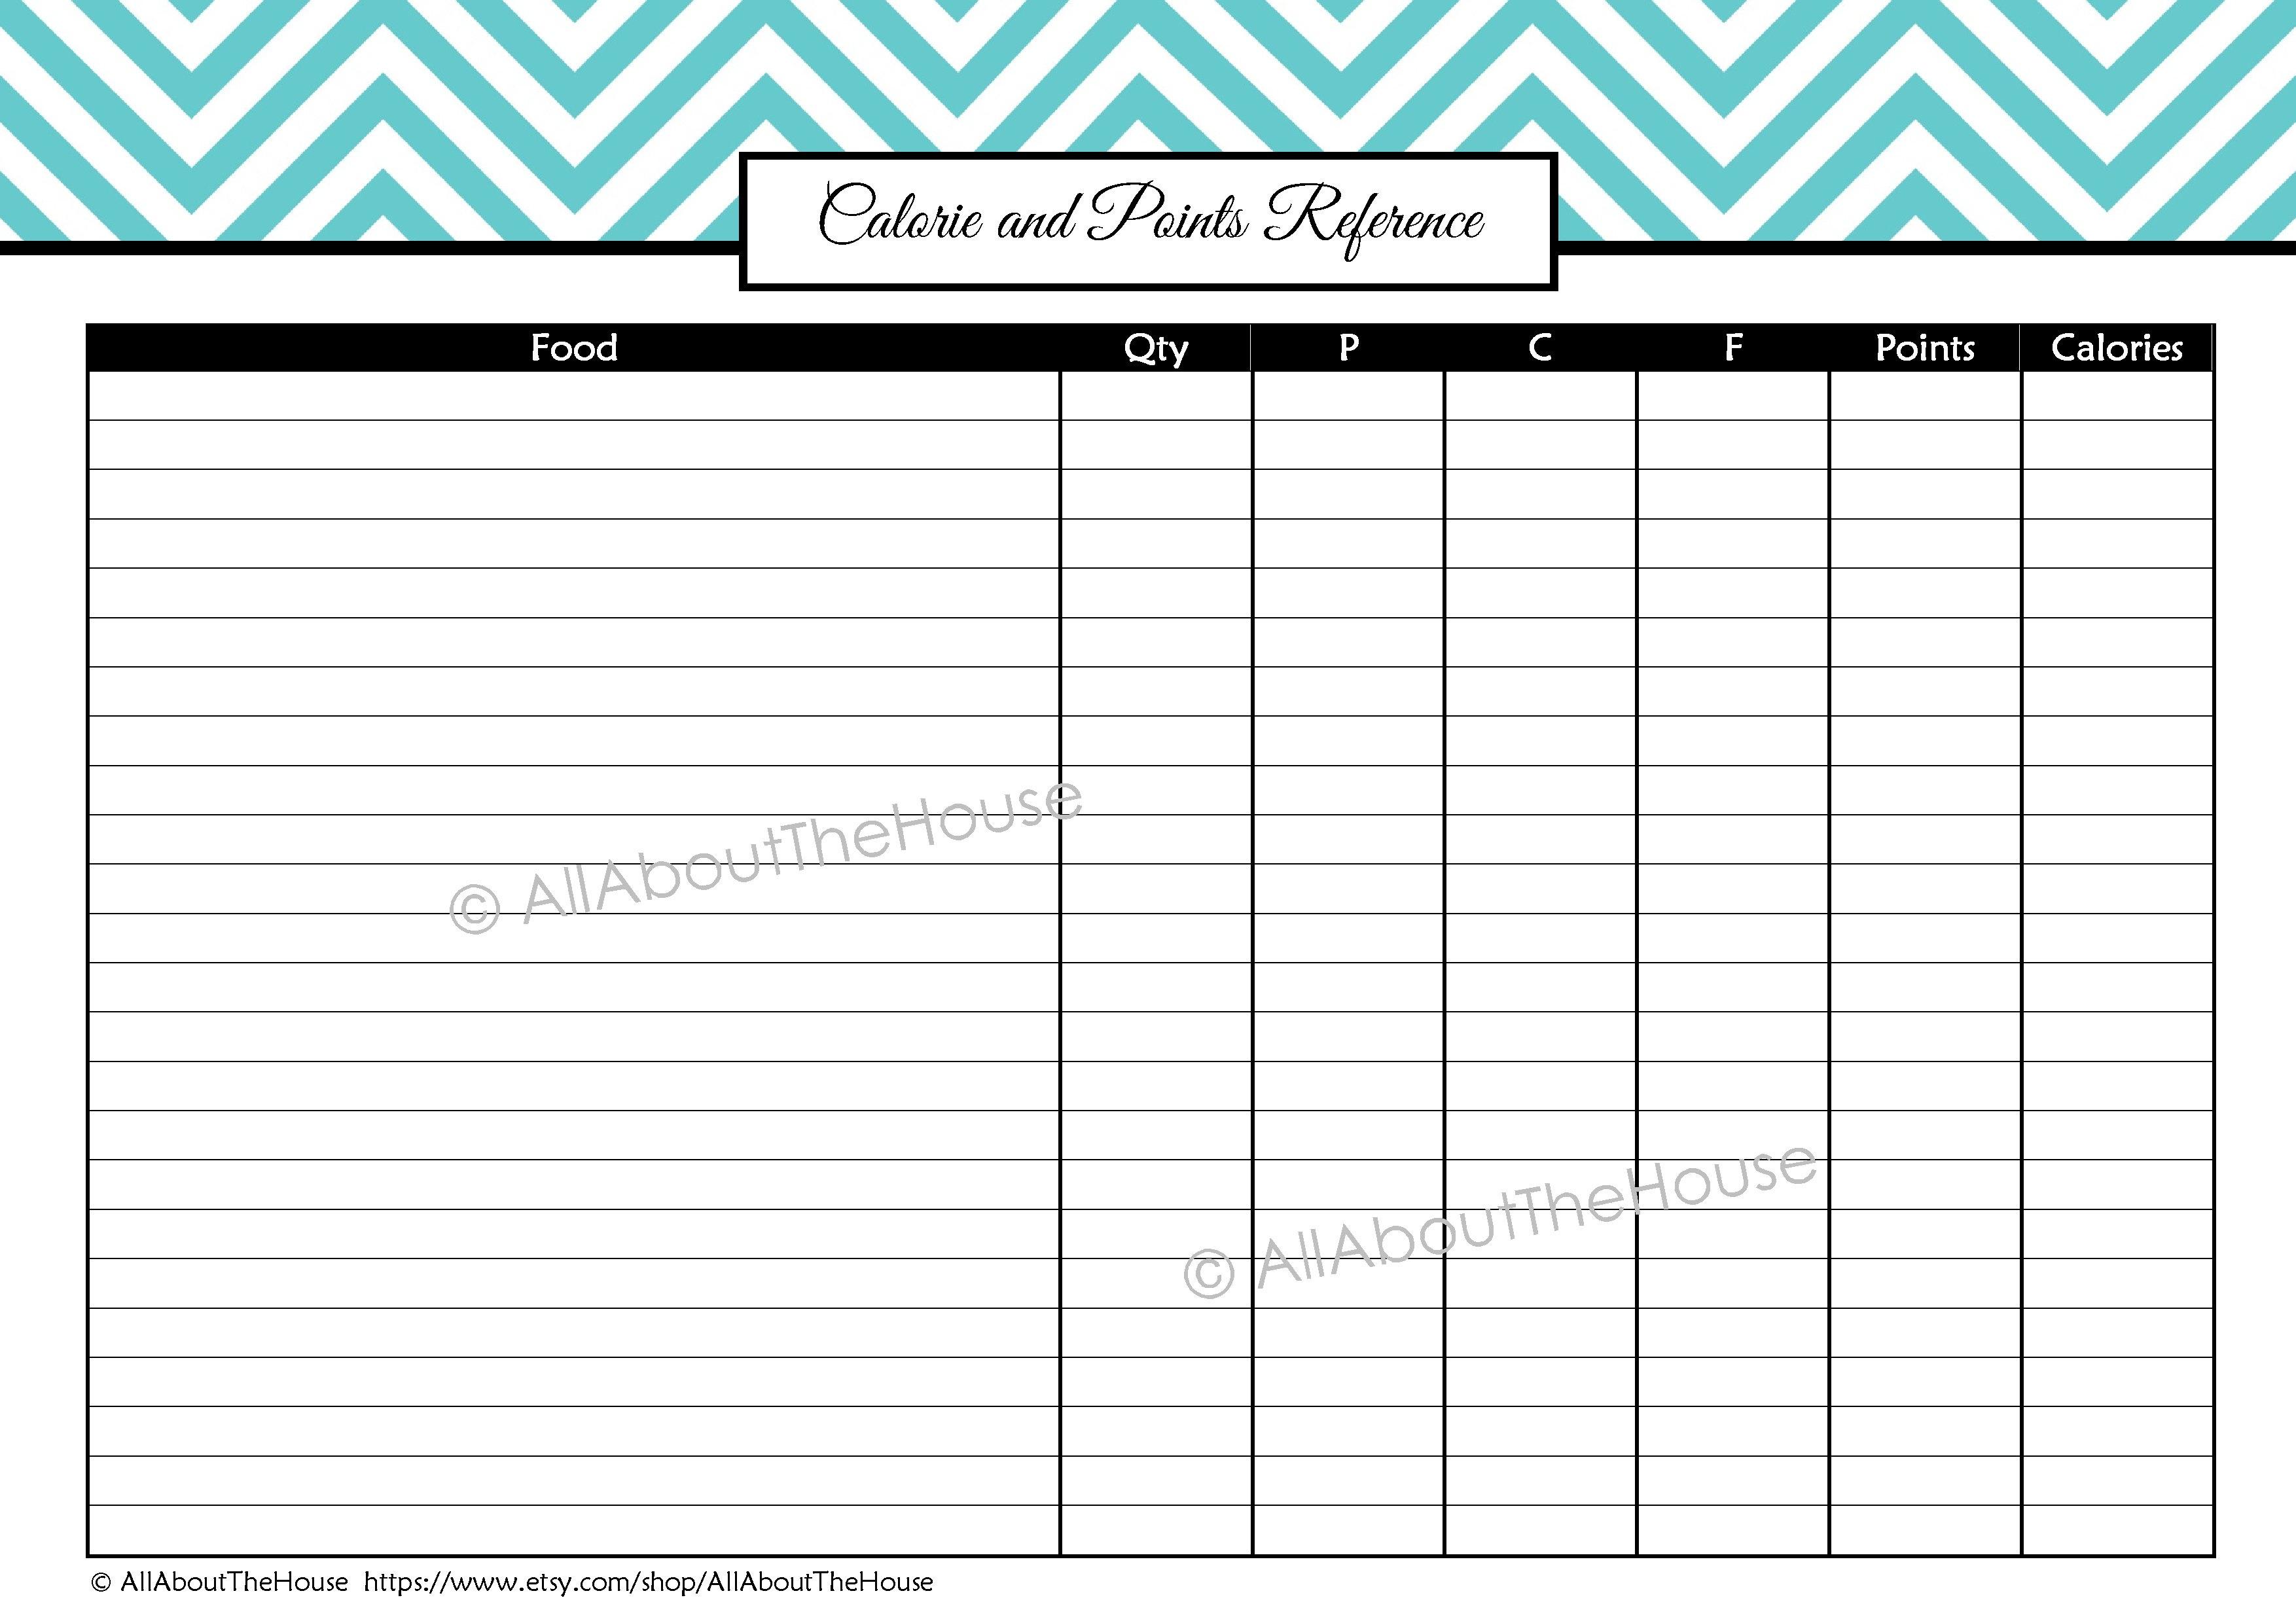 Log Calories - Kaza.psstech.co - Free Printable Calorie Counter Sheet